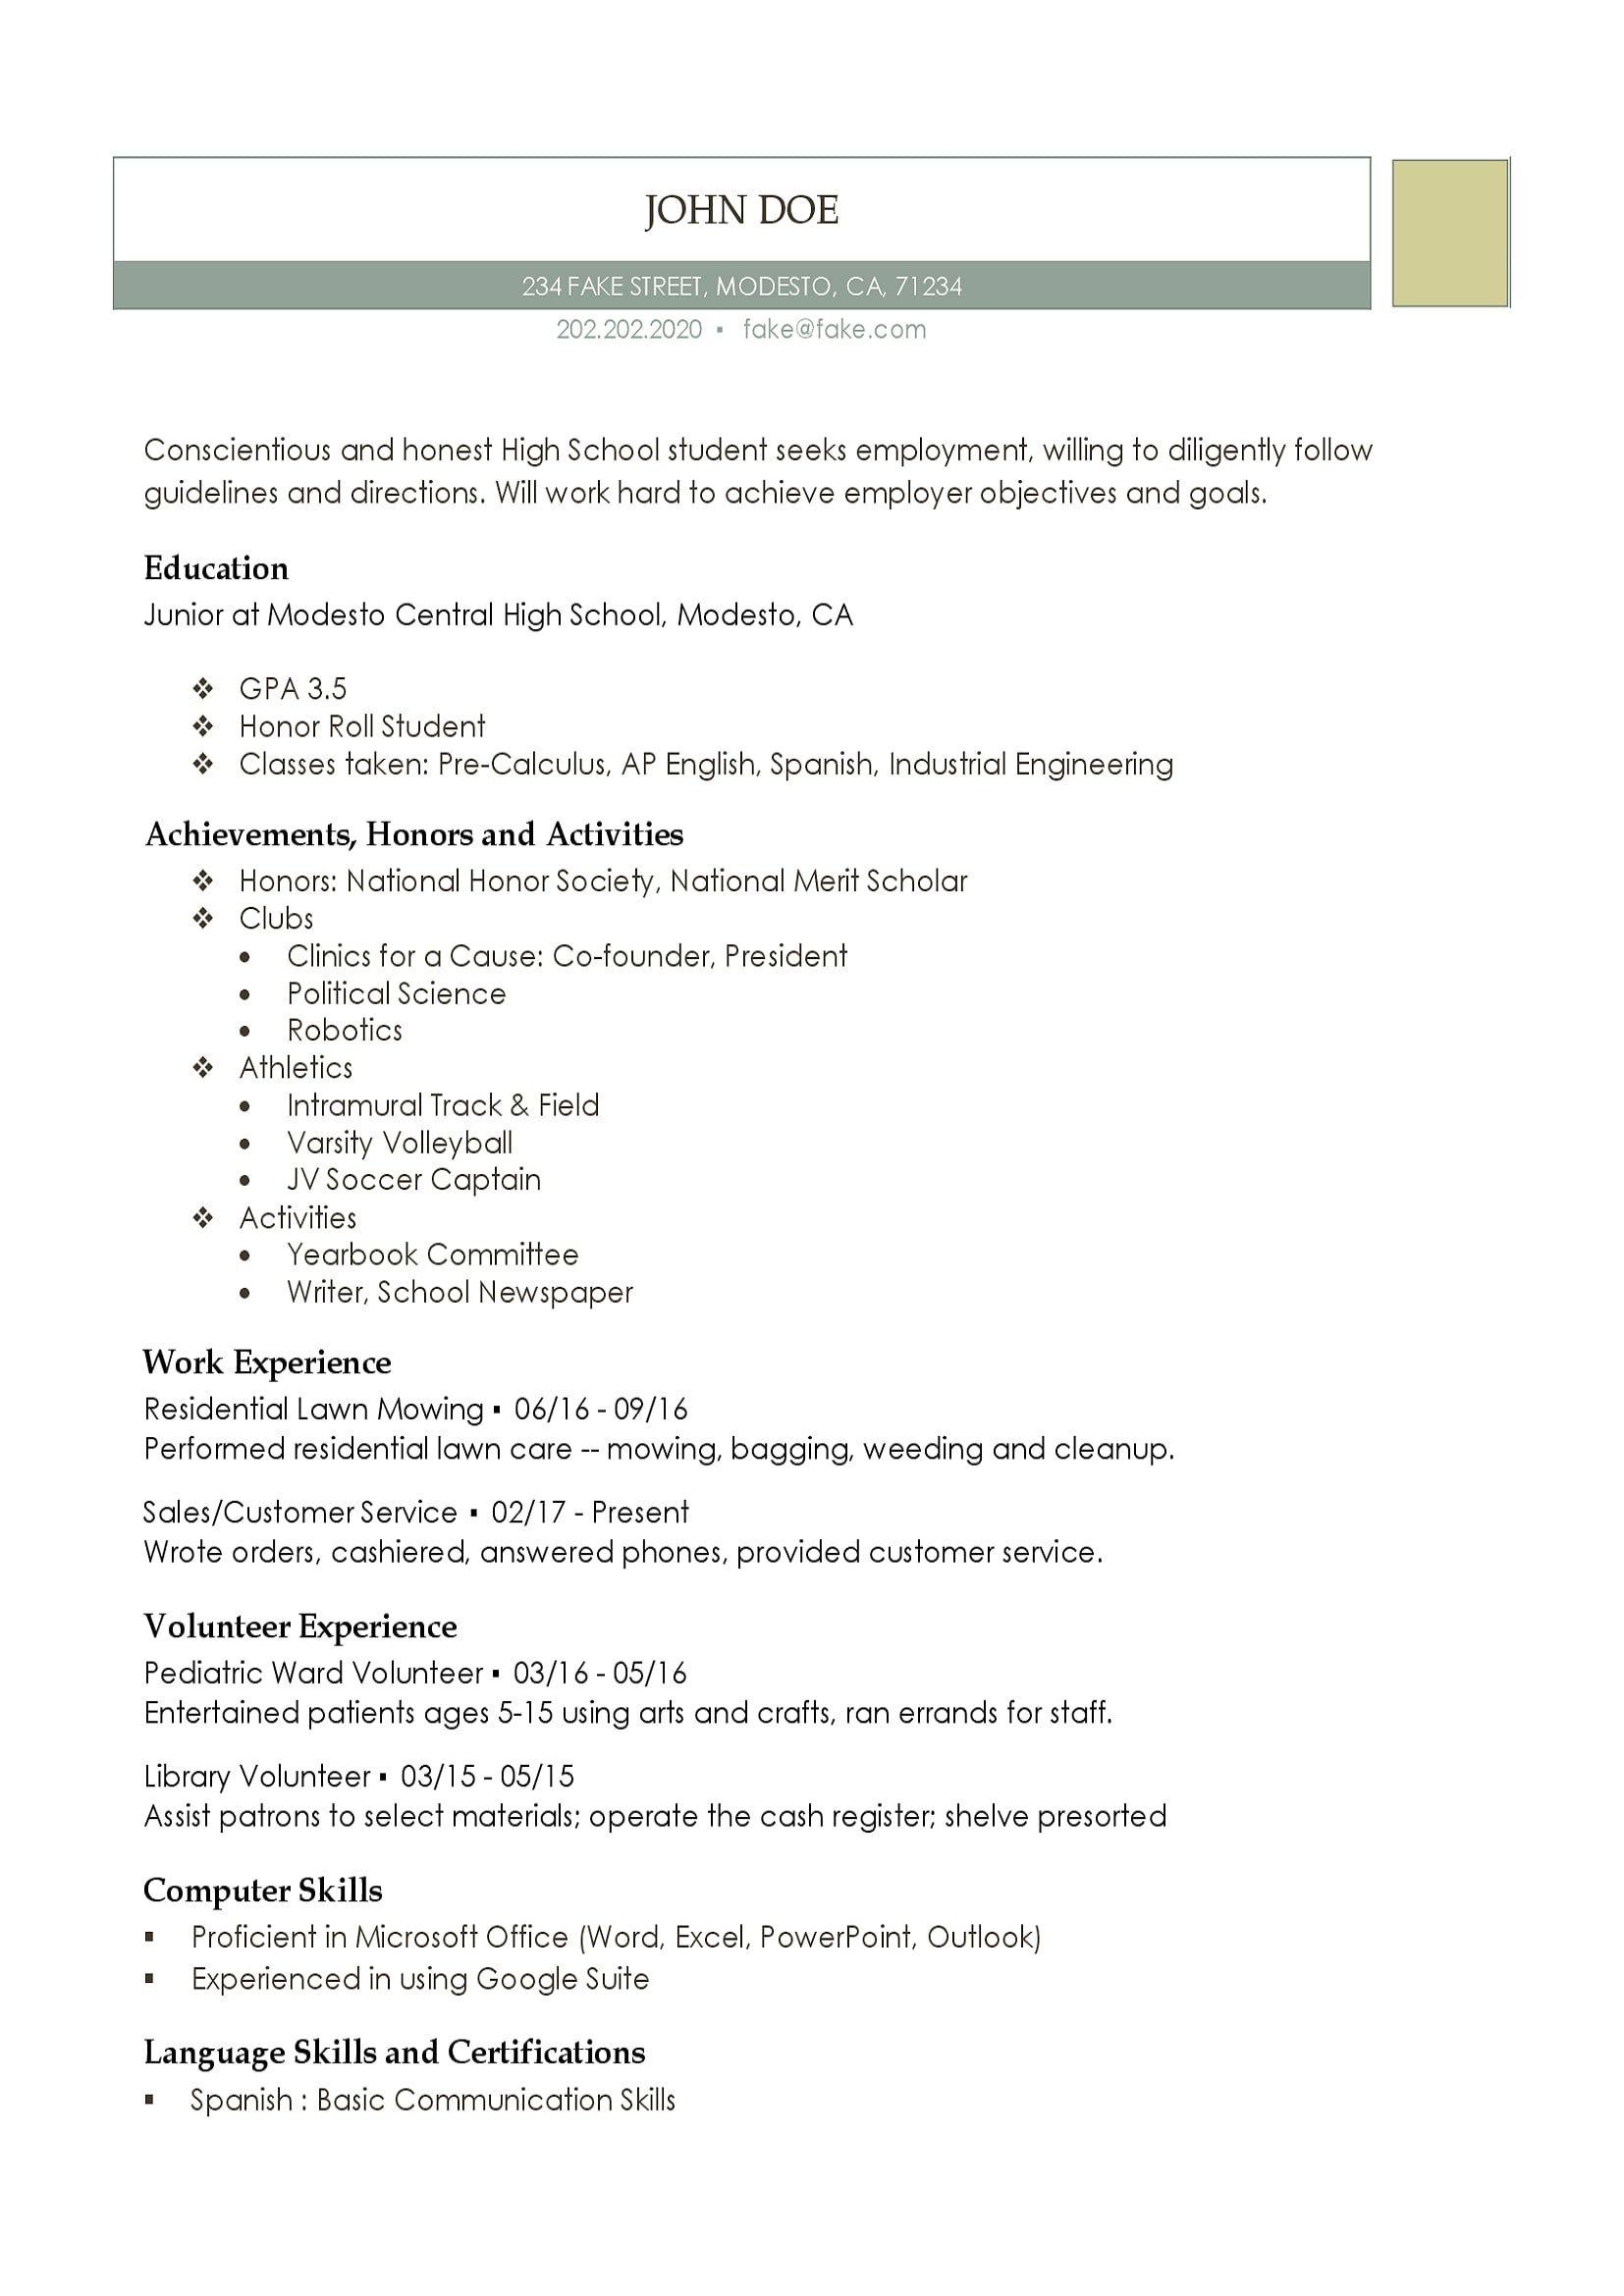 003 Unusual Basic Student Resume Template Picture  Simple Word High School Australia Google DocFull